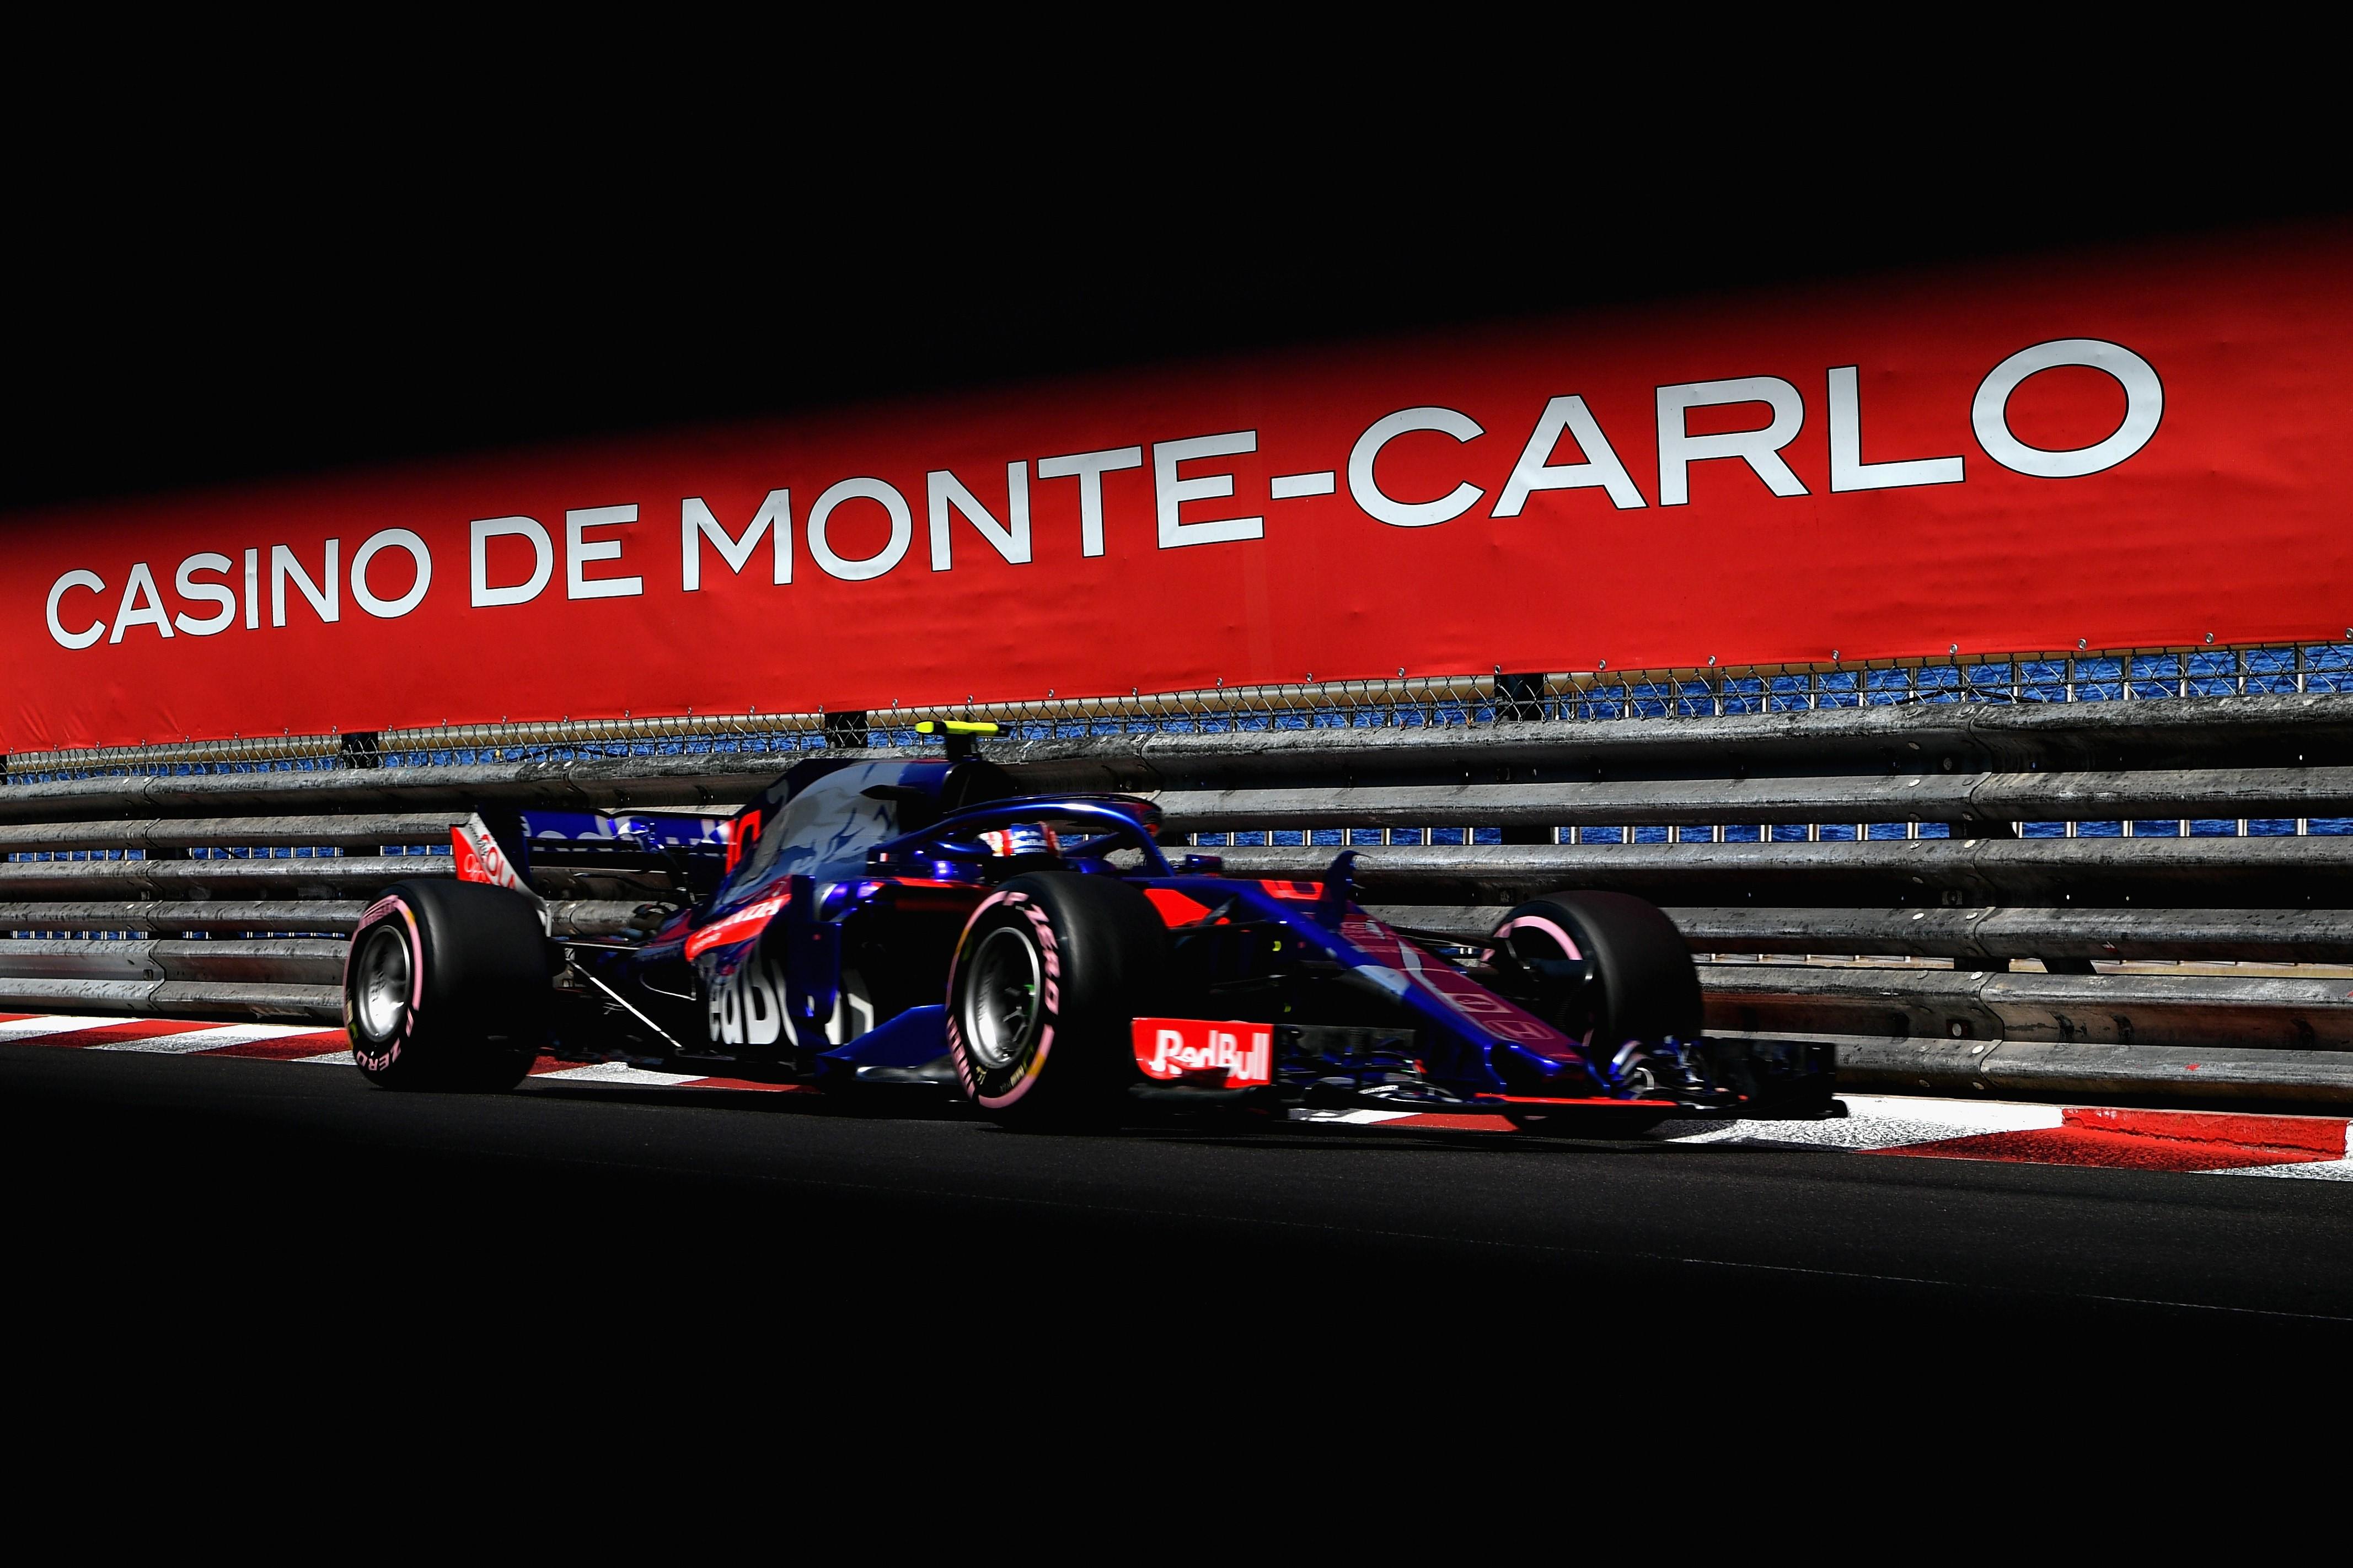 Pierre Gasly (Toro Rosso) au Grand Prix de Monaco 2018